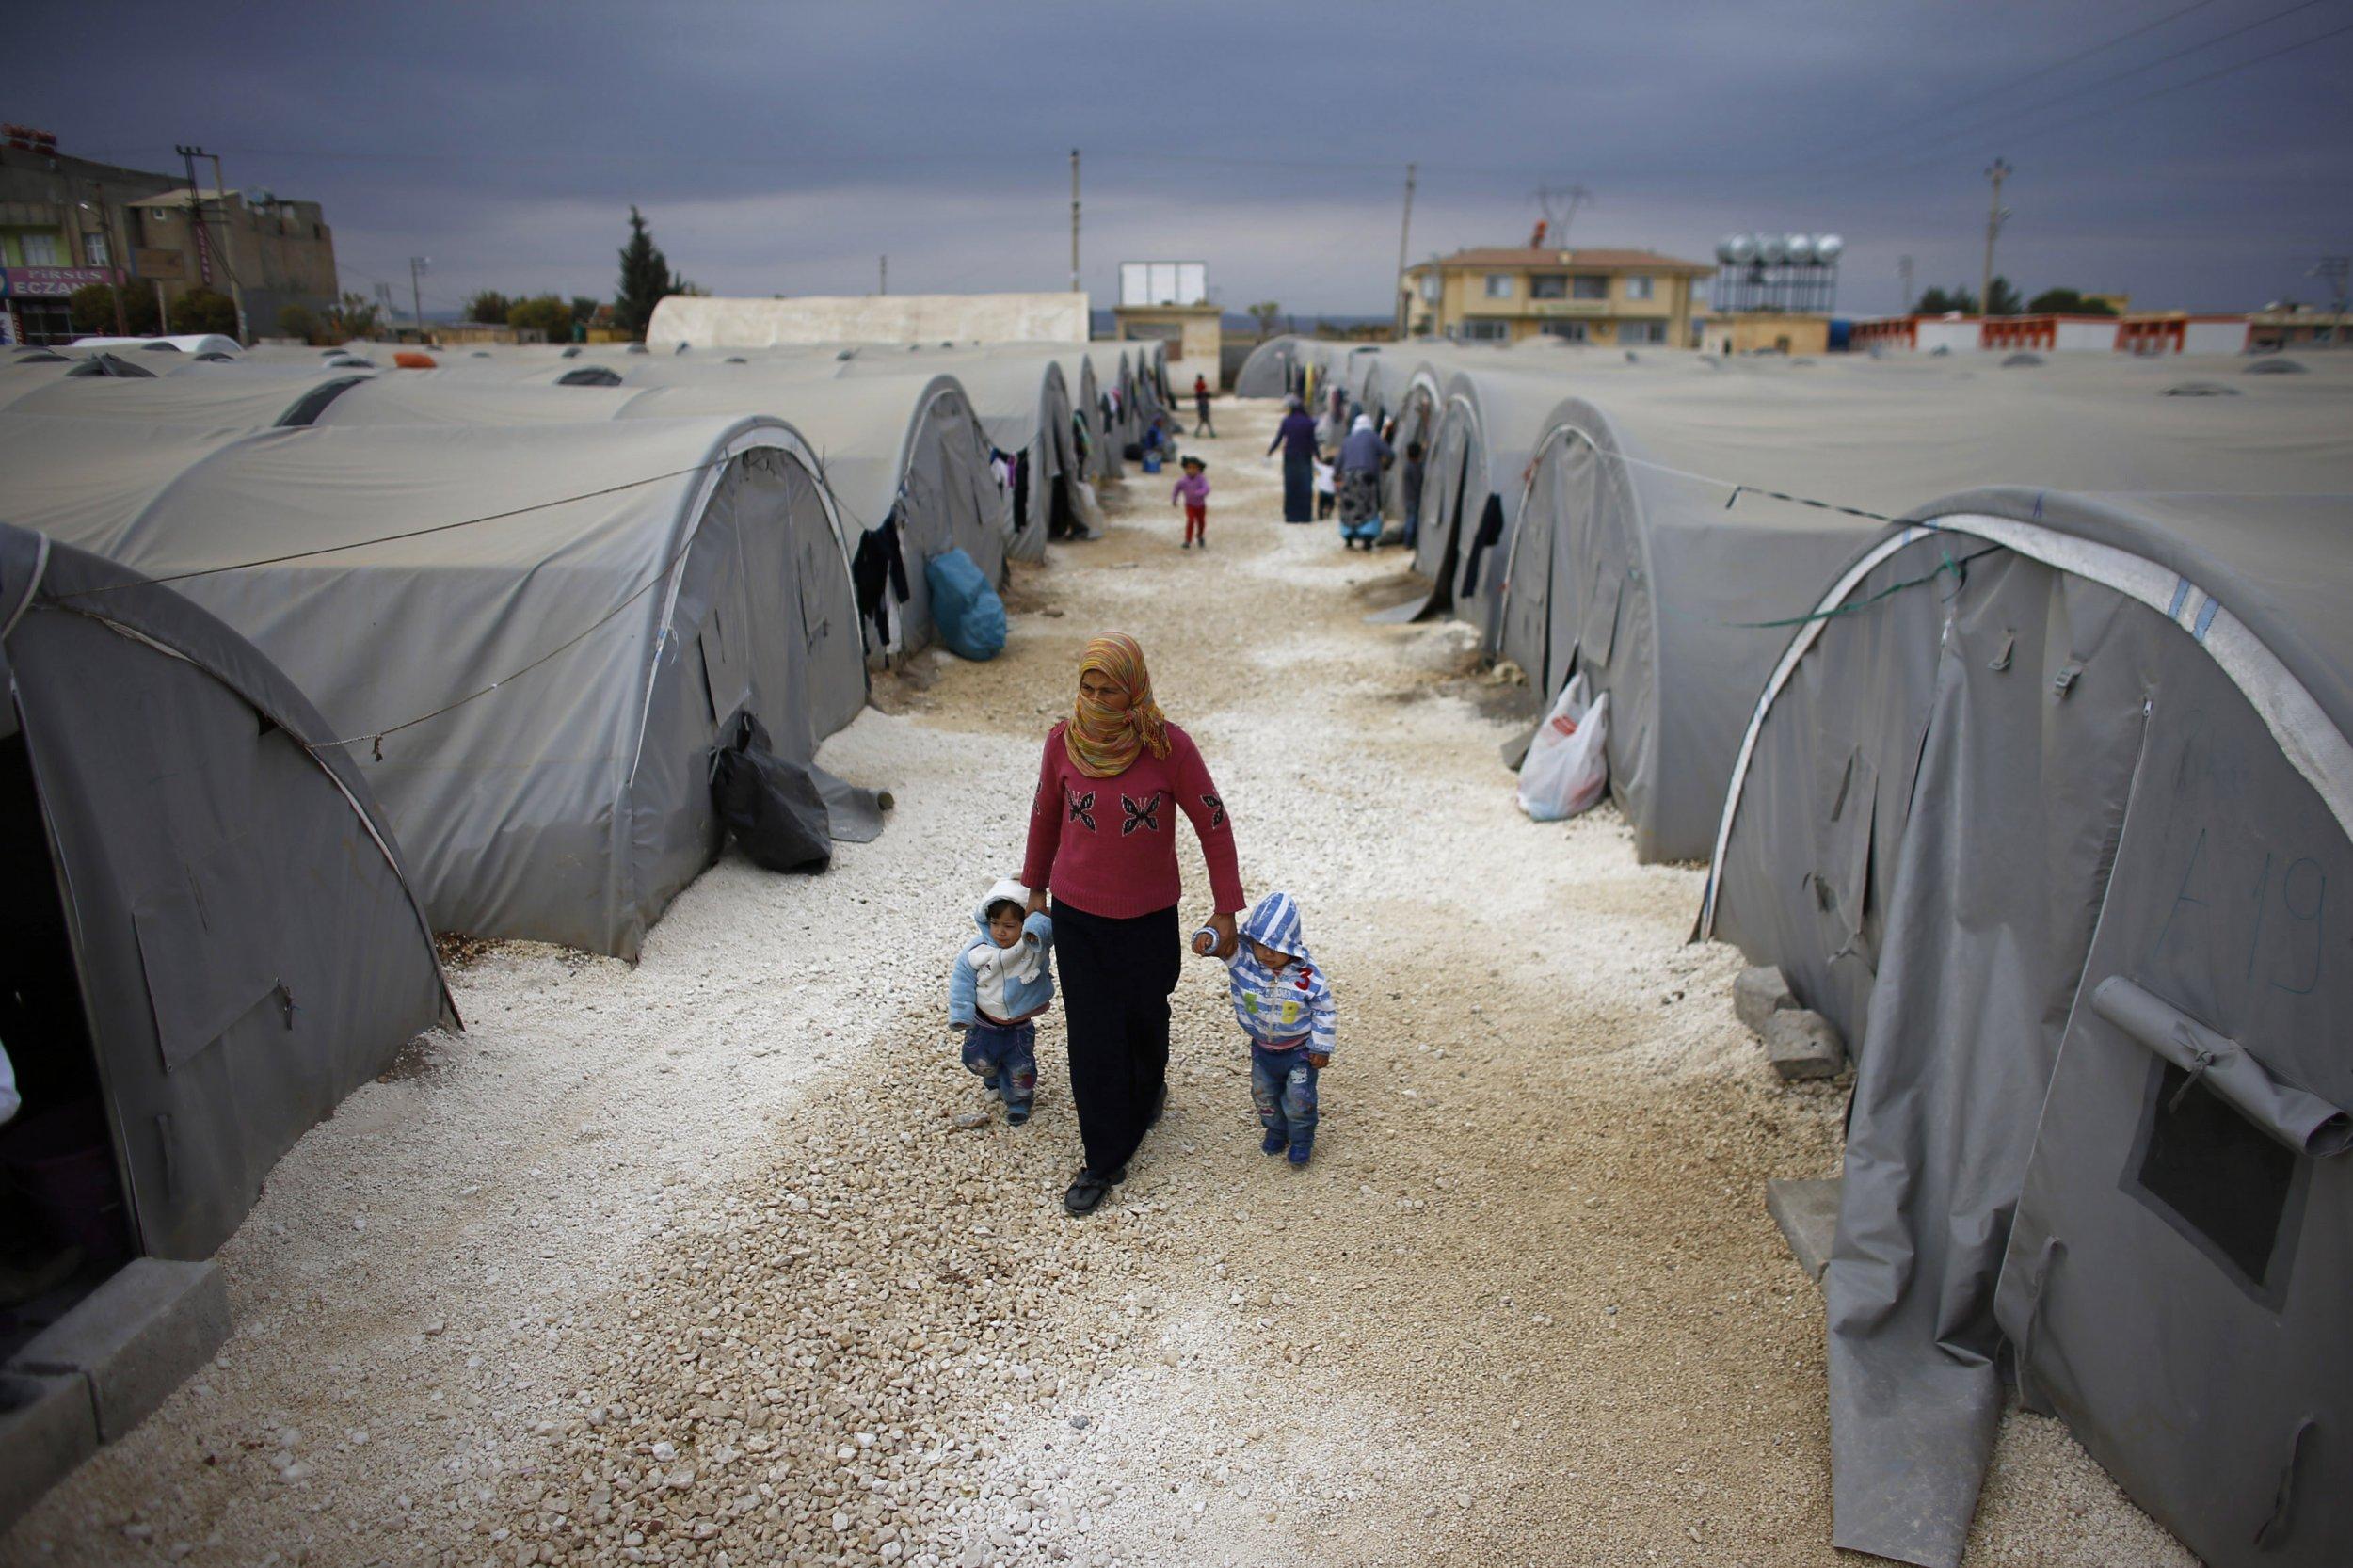 A Kurdish refugee from Syria walks with her children at a refugee camp in Turkey